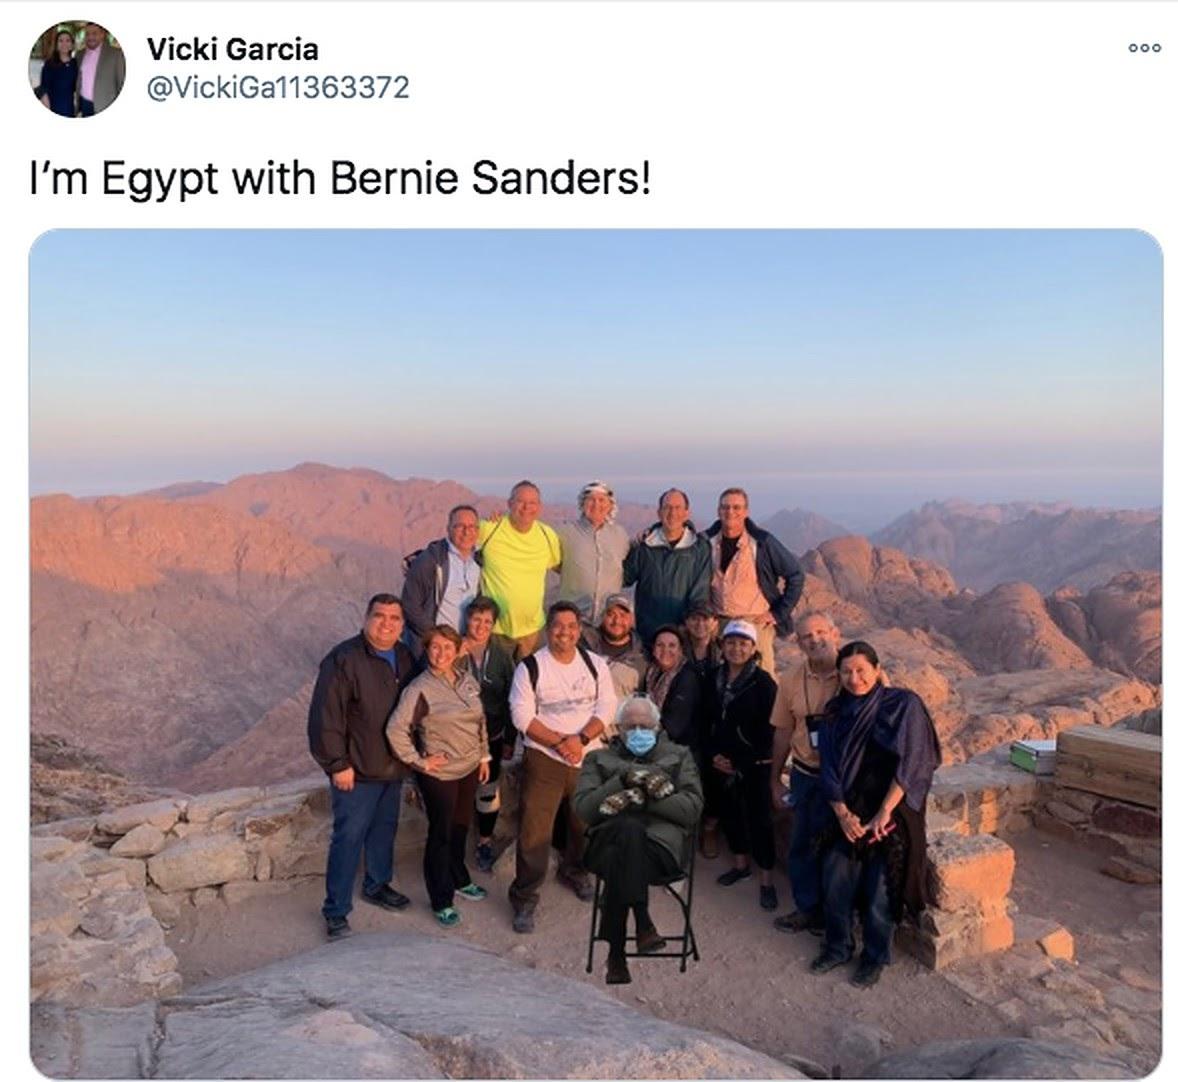 Bernie Sanders Meme Reaches Egypt | Egyptian Streets